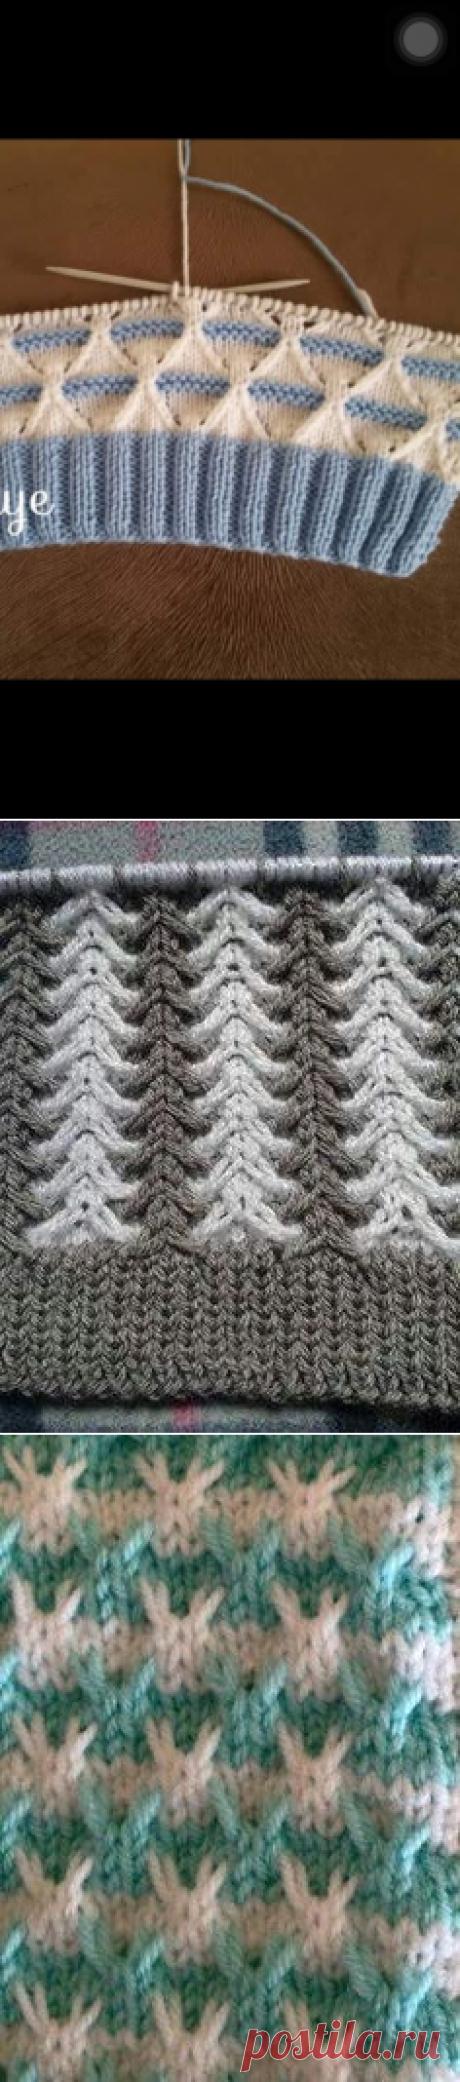 Пин от пользователя habibe giren на доске knit stitch